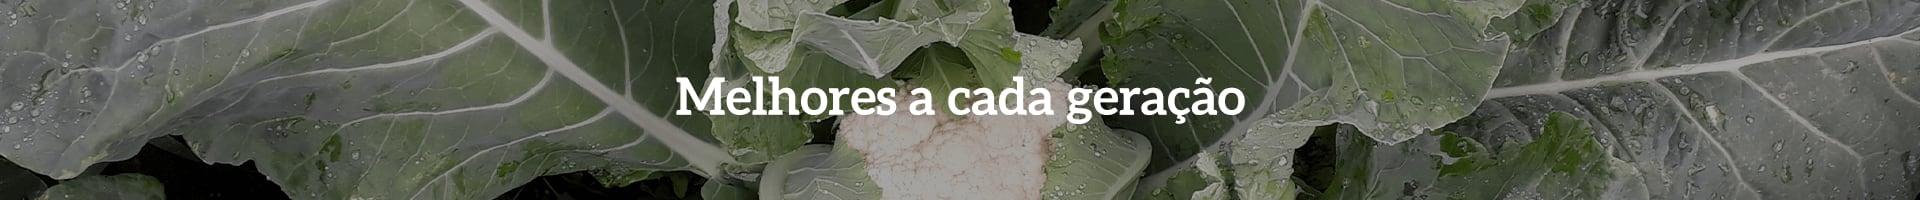 Couves-Flores Seminis